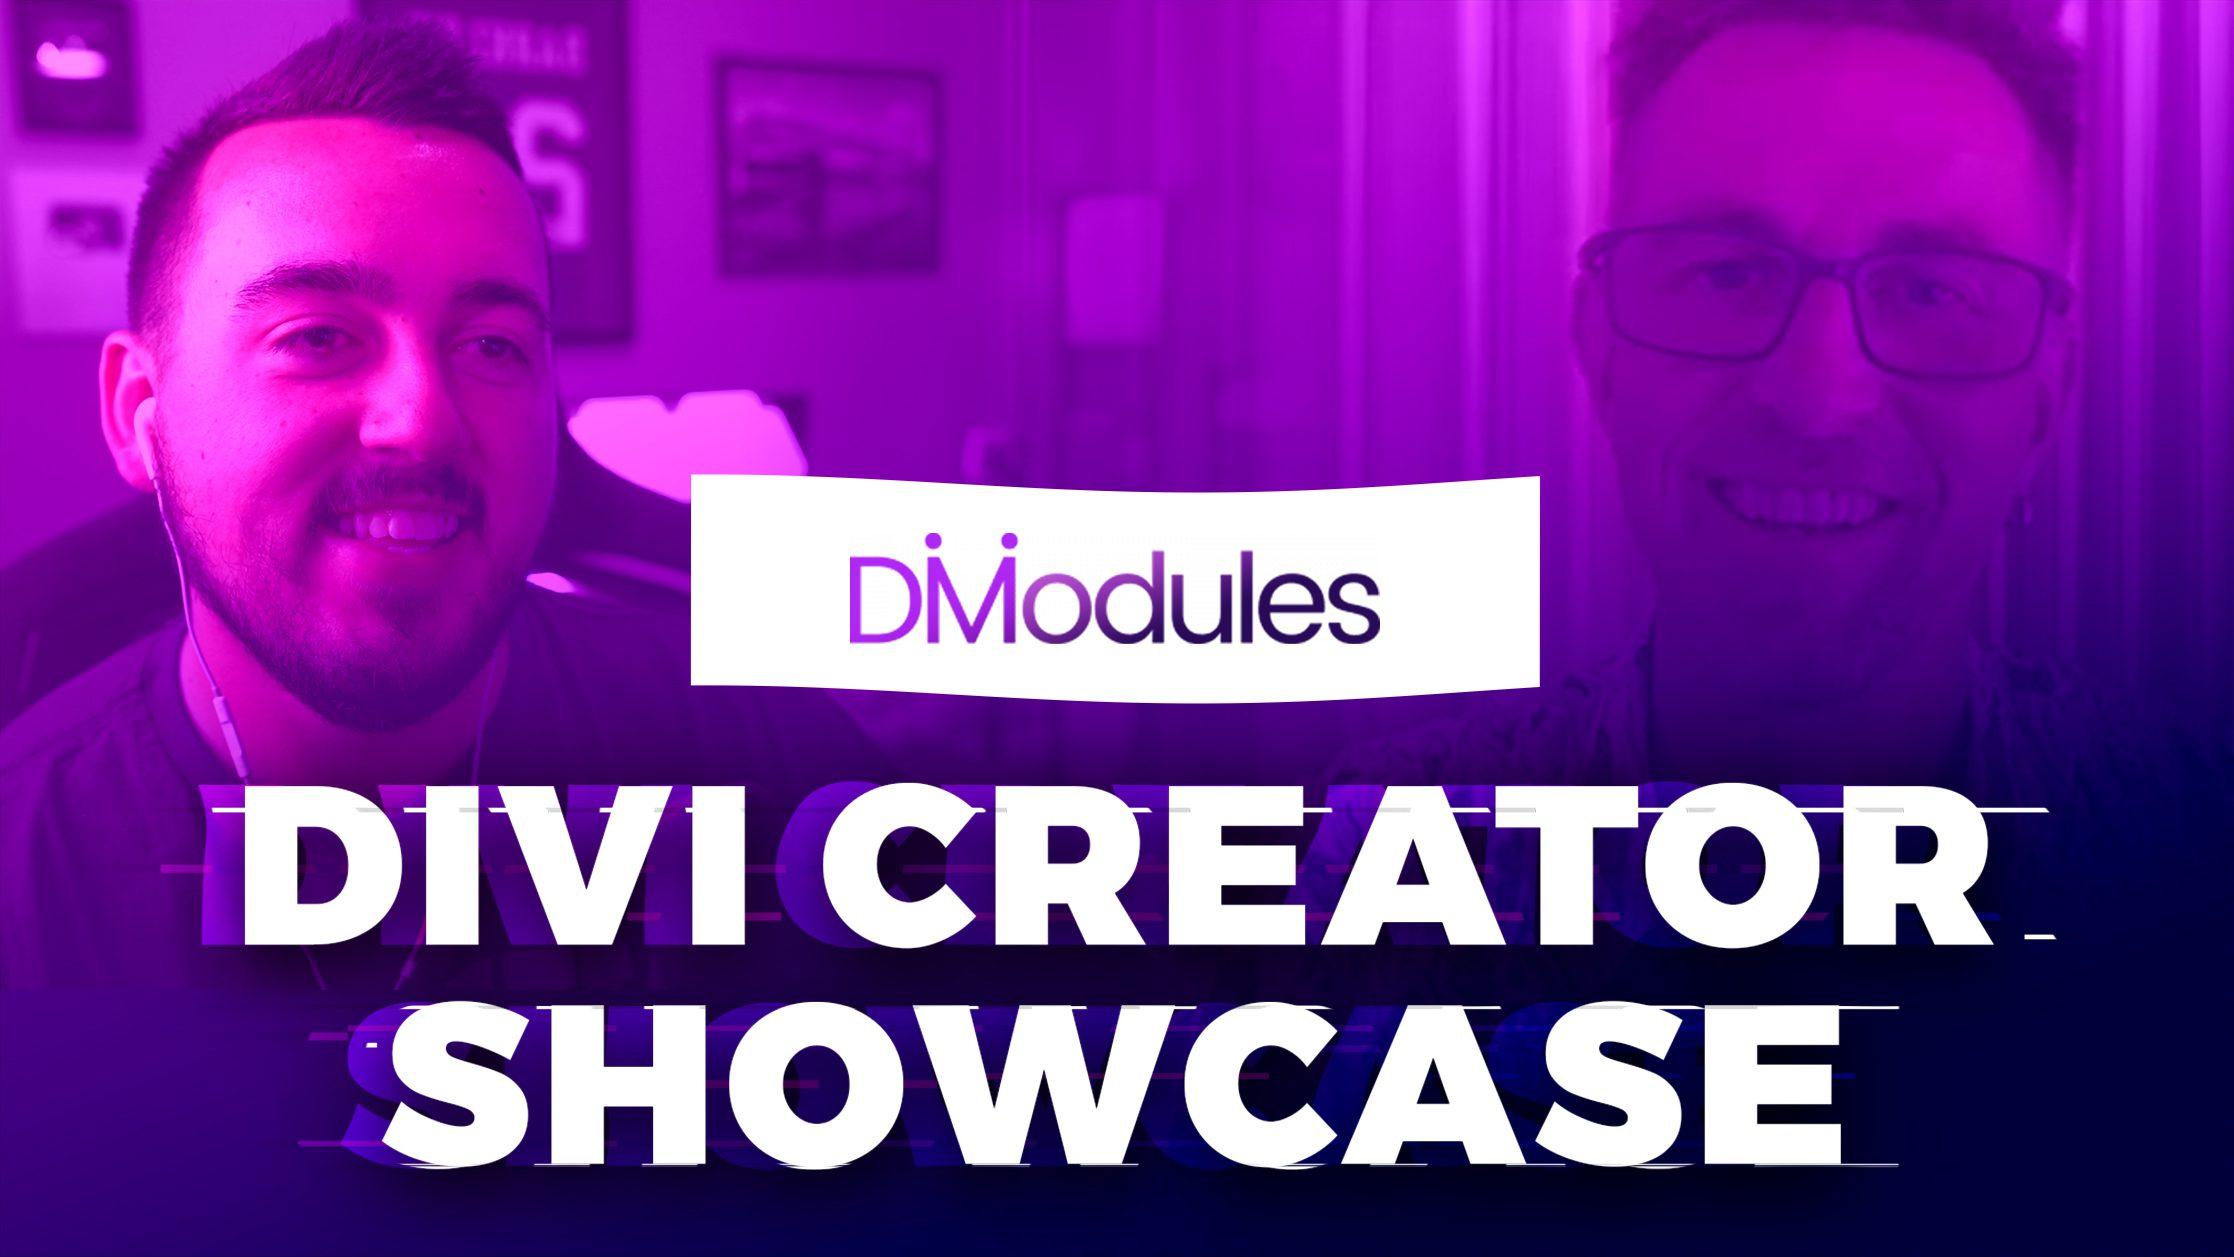 Divi Creator Showcase: Divi-Modules